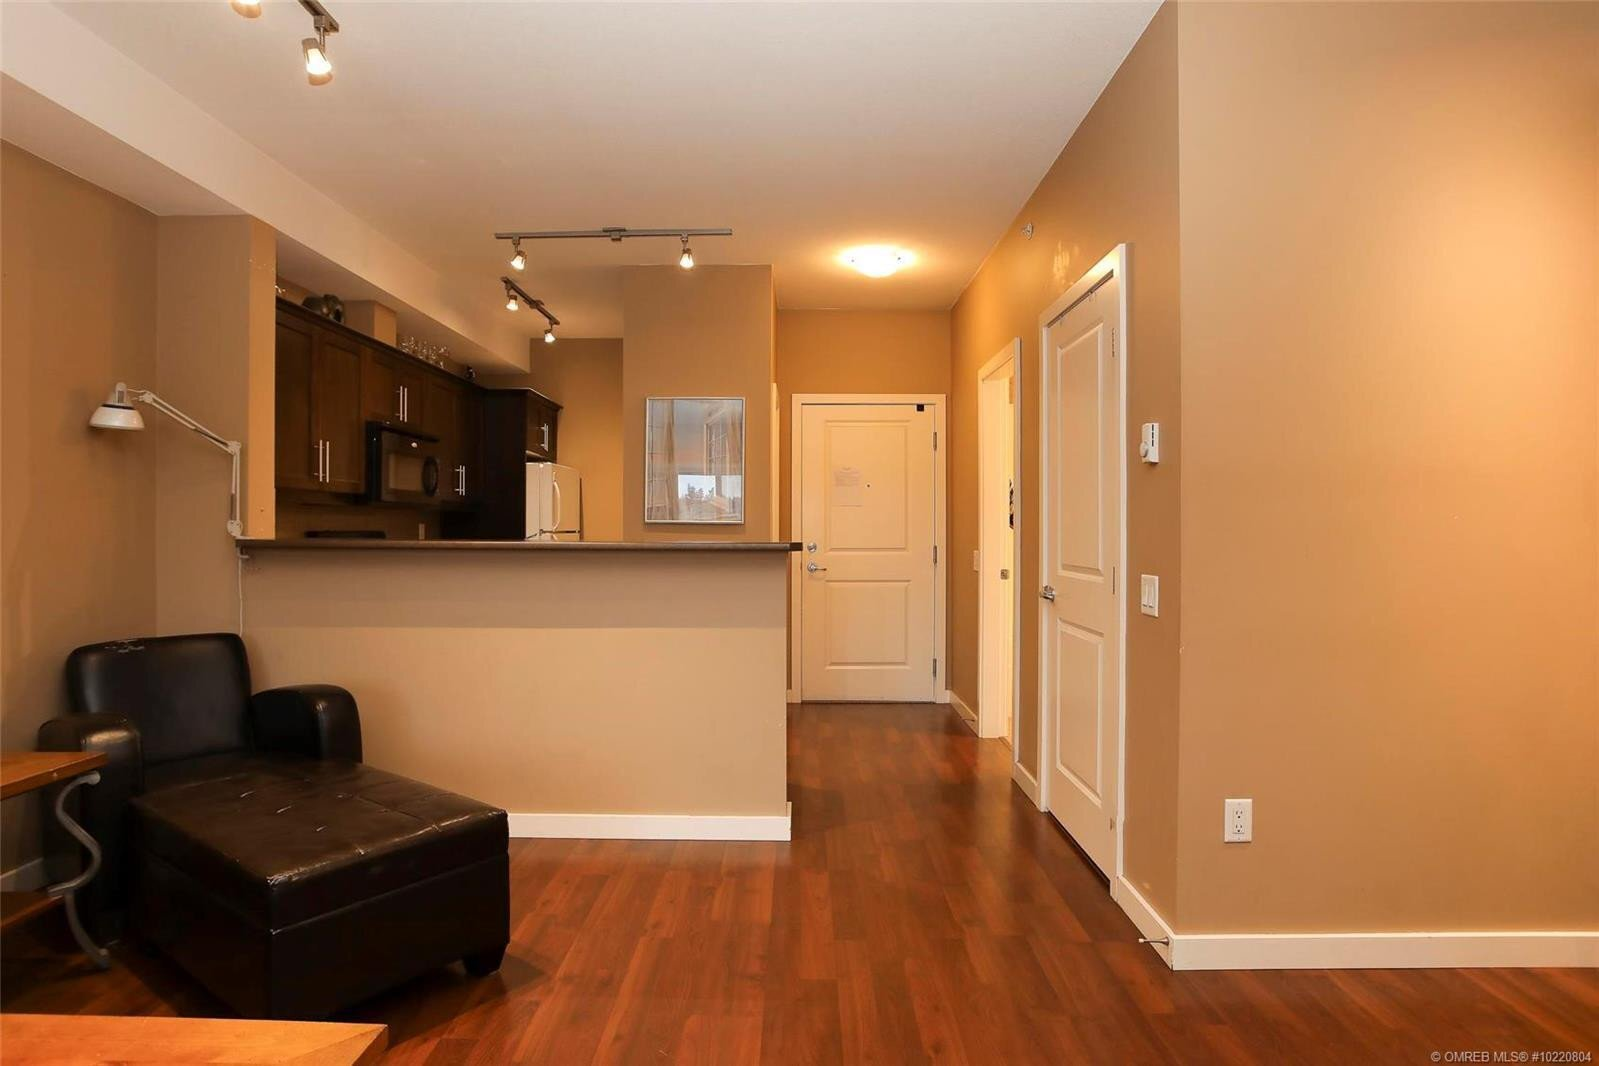 Condo for sale at 151 Taylor Rd Unit 313 Kelowna British Columbia - MLS: 10220804